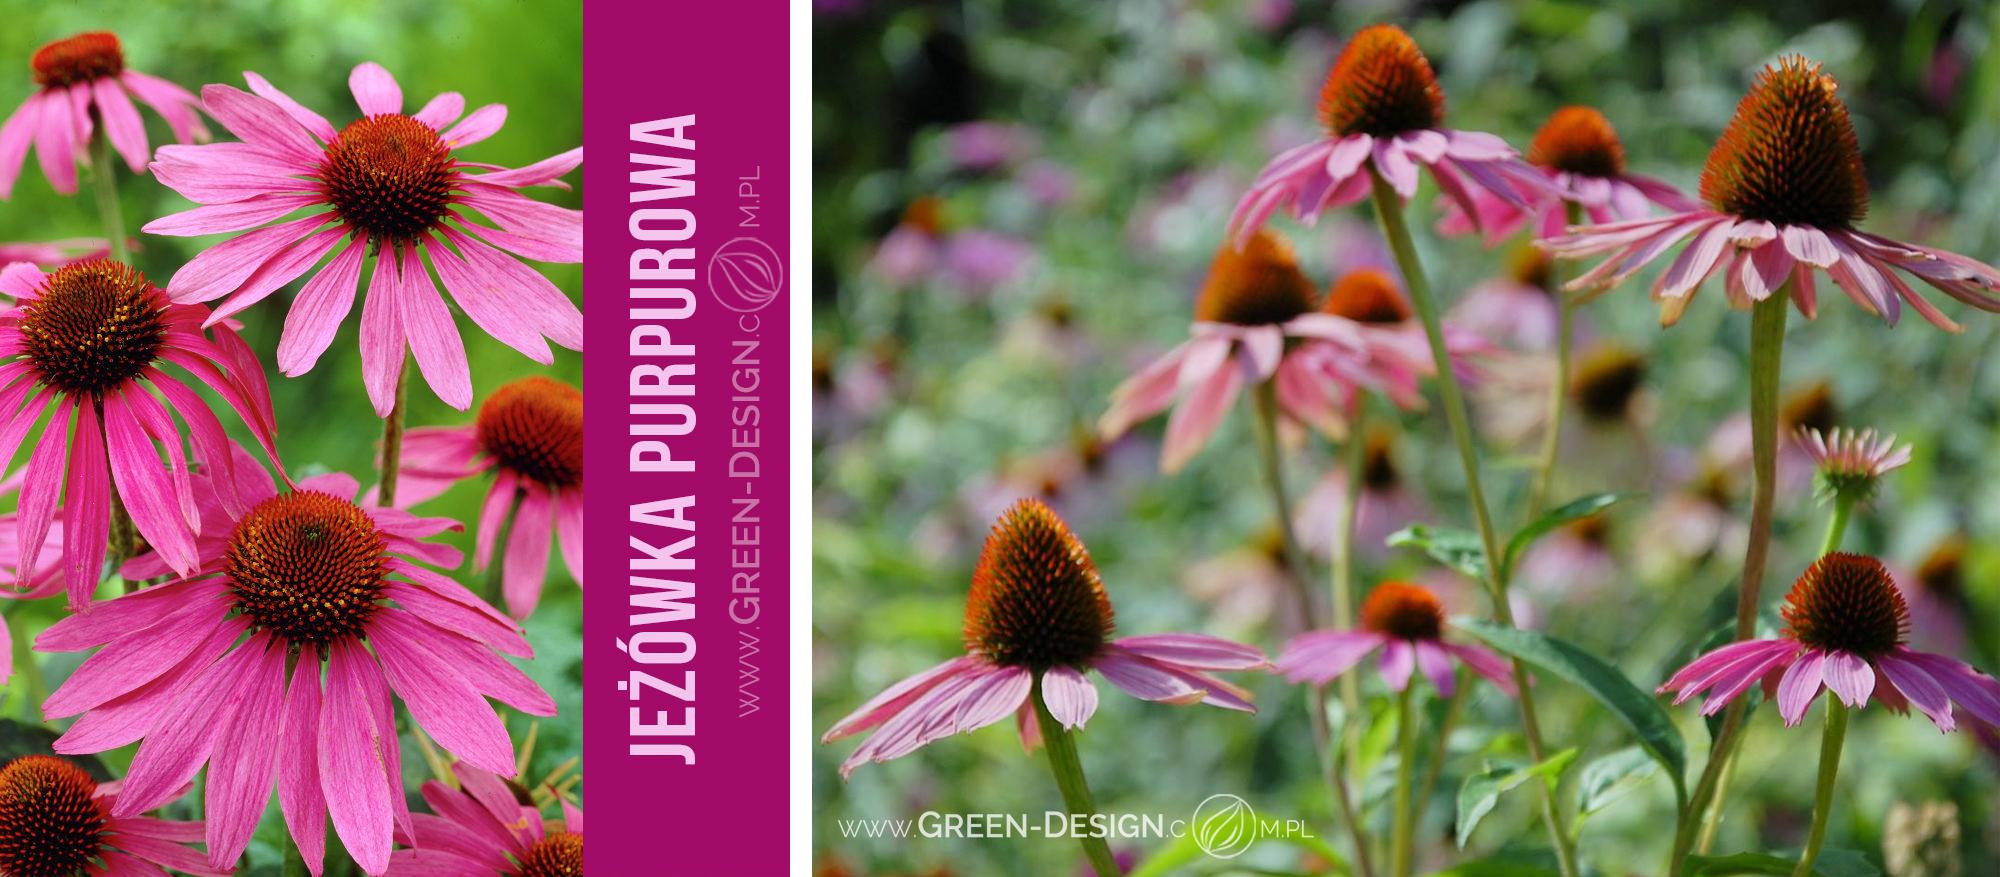 Green-Design-Blog_jeżówka_cover_photo_1